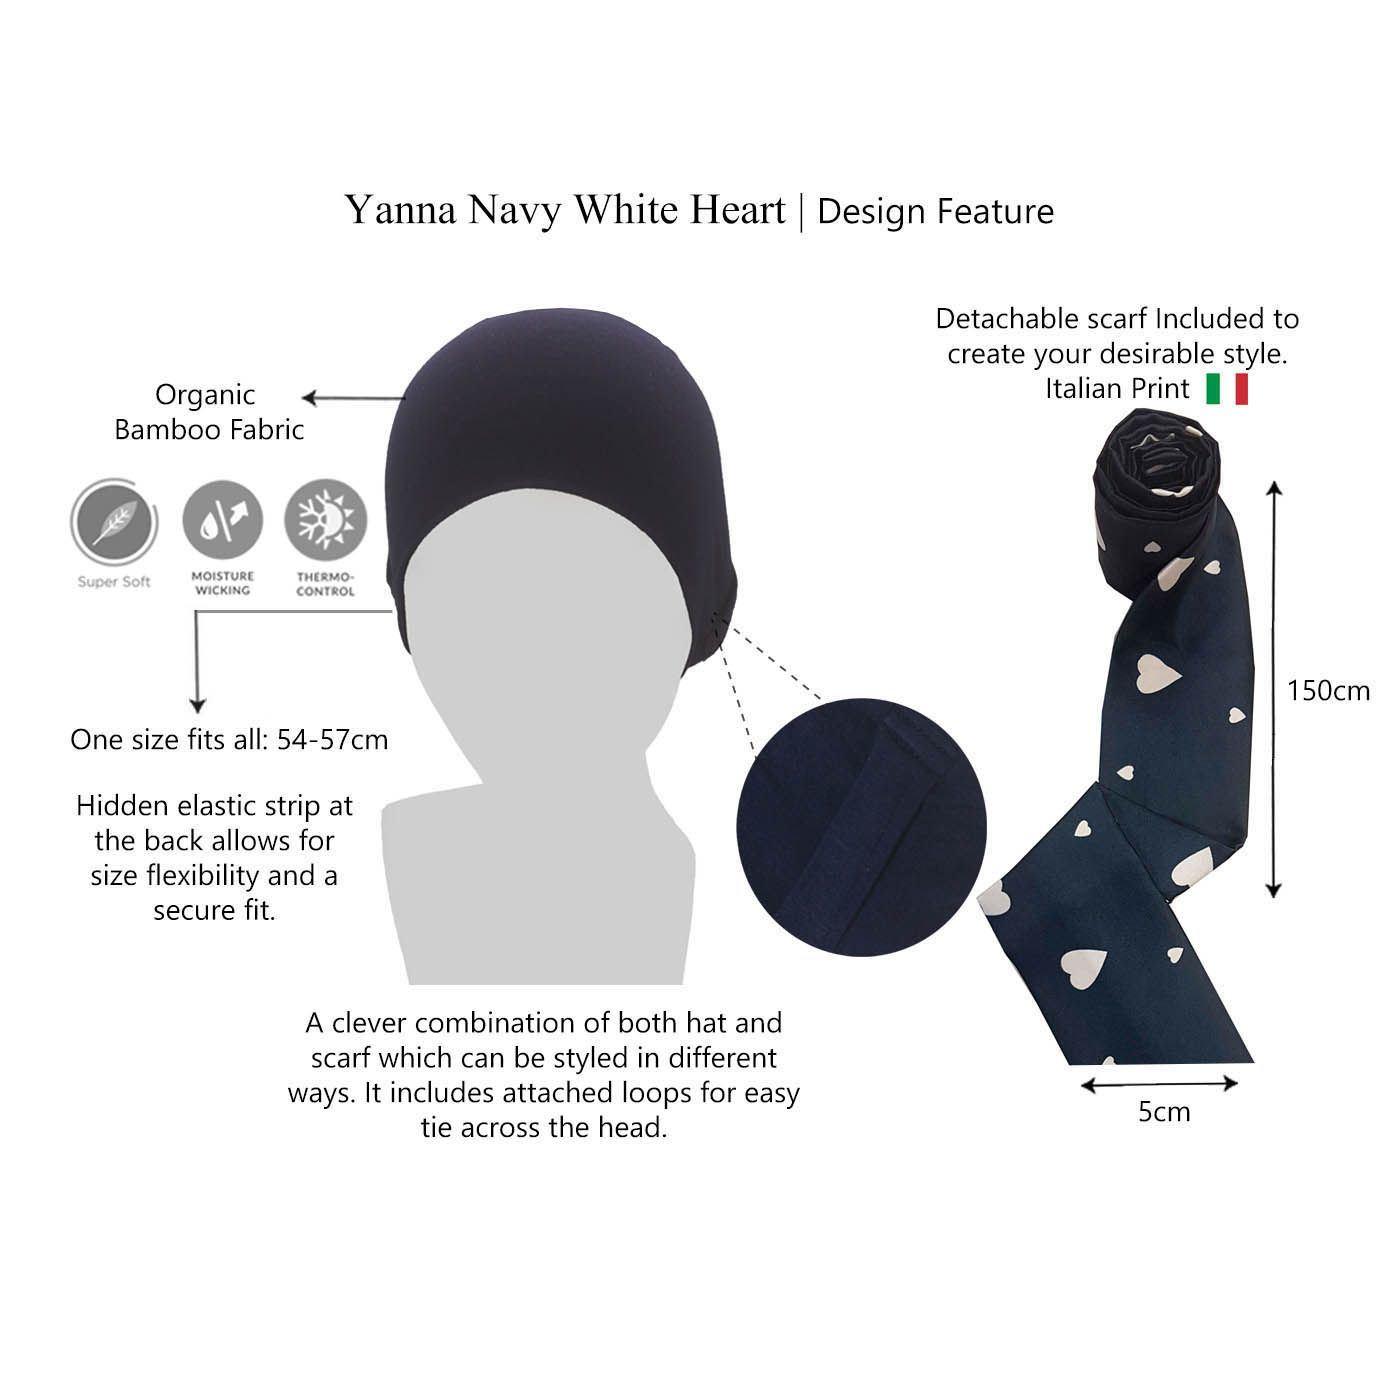 Yanna Navy White Heart